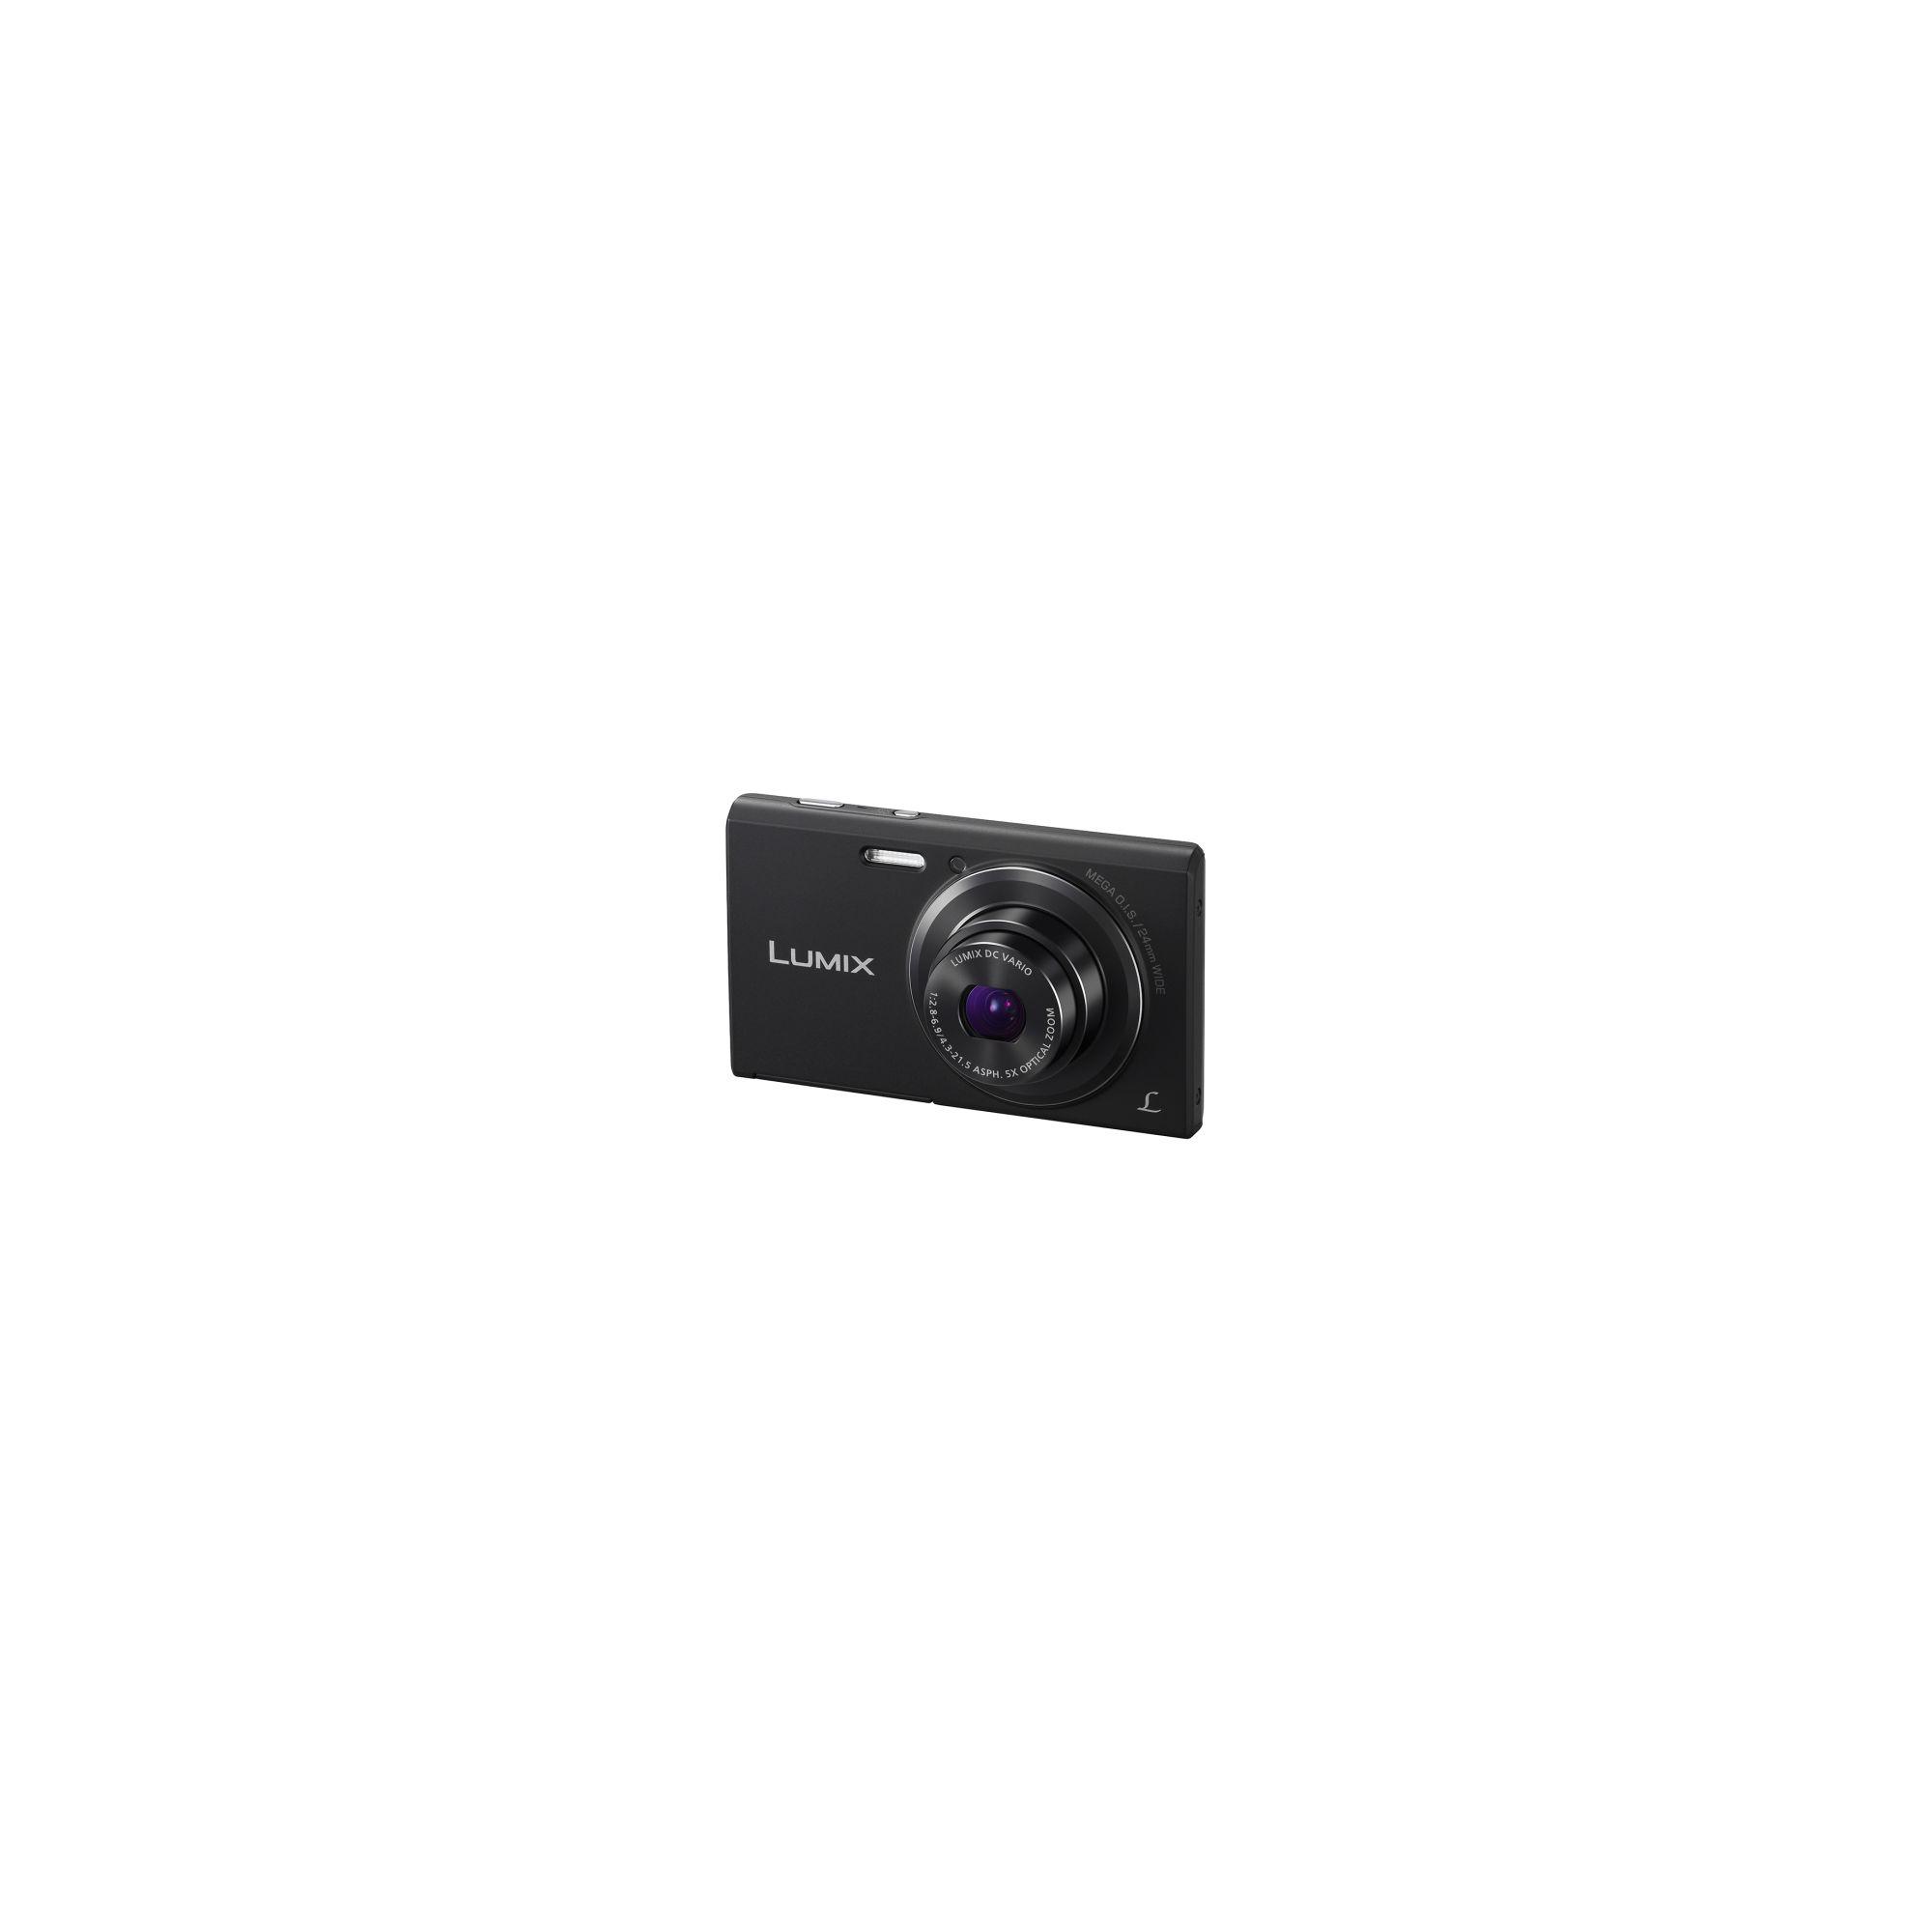 Panasonic Lumix FS50 Digital Camera, Black, 16MP, 5x Optical Zoom, 2.7 inch LCD Screen